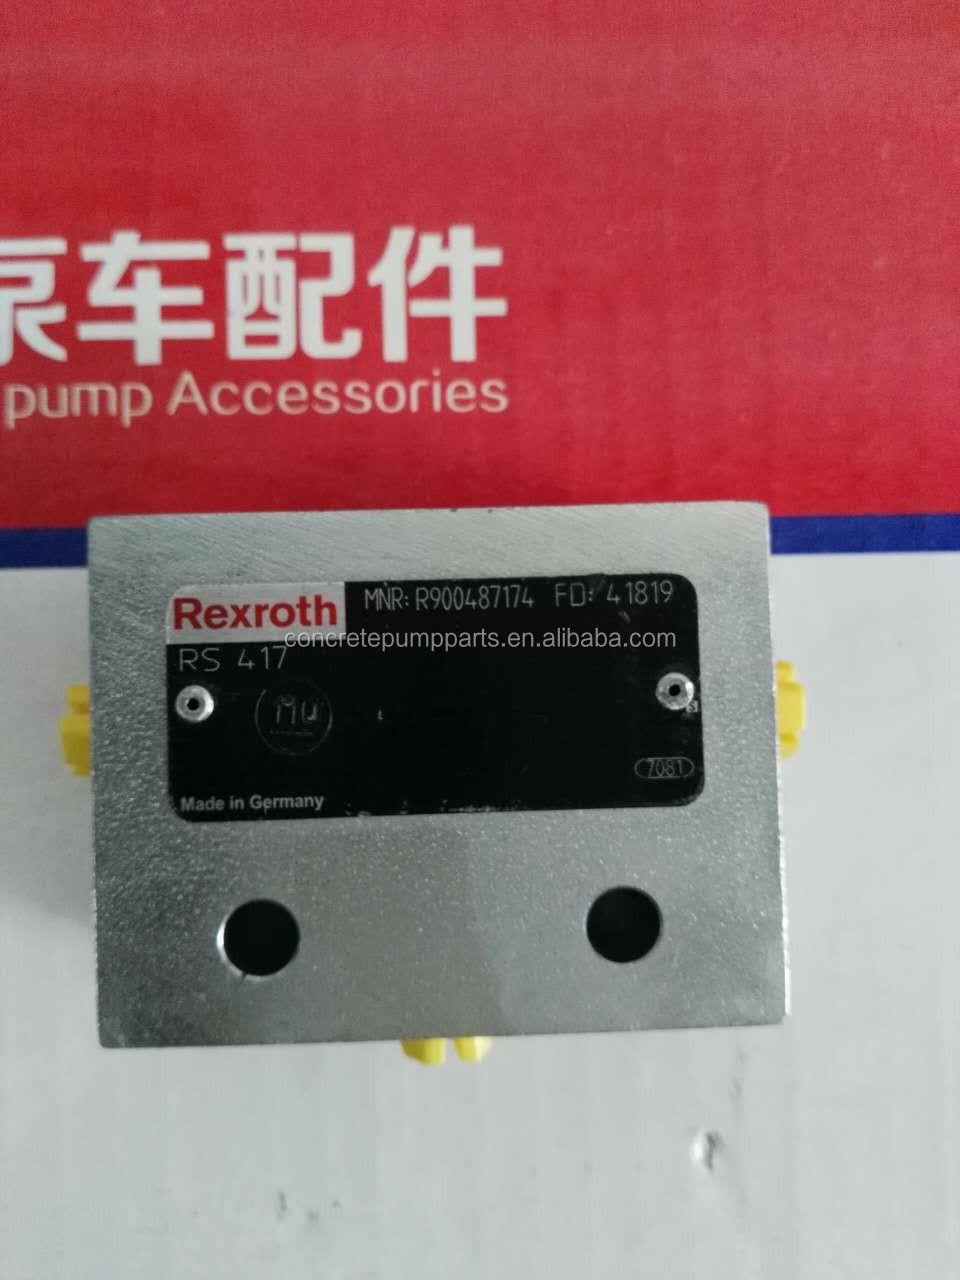 Rexroth Valve Rs 417 Mnr: R900487174